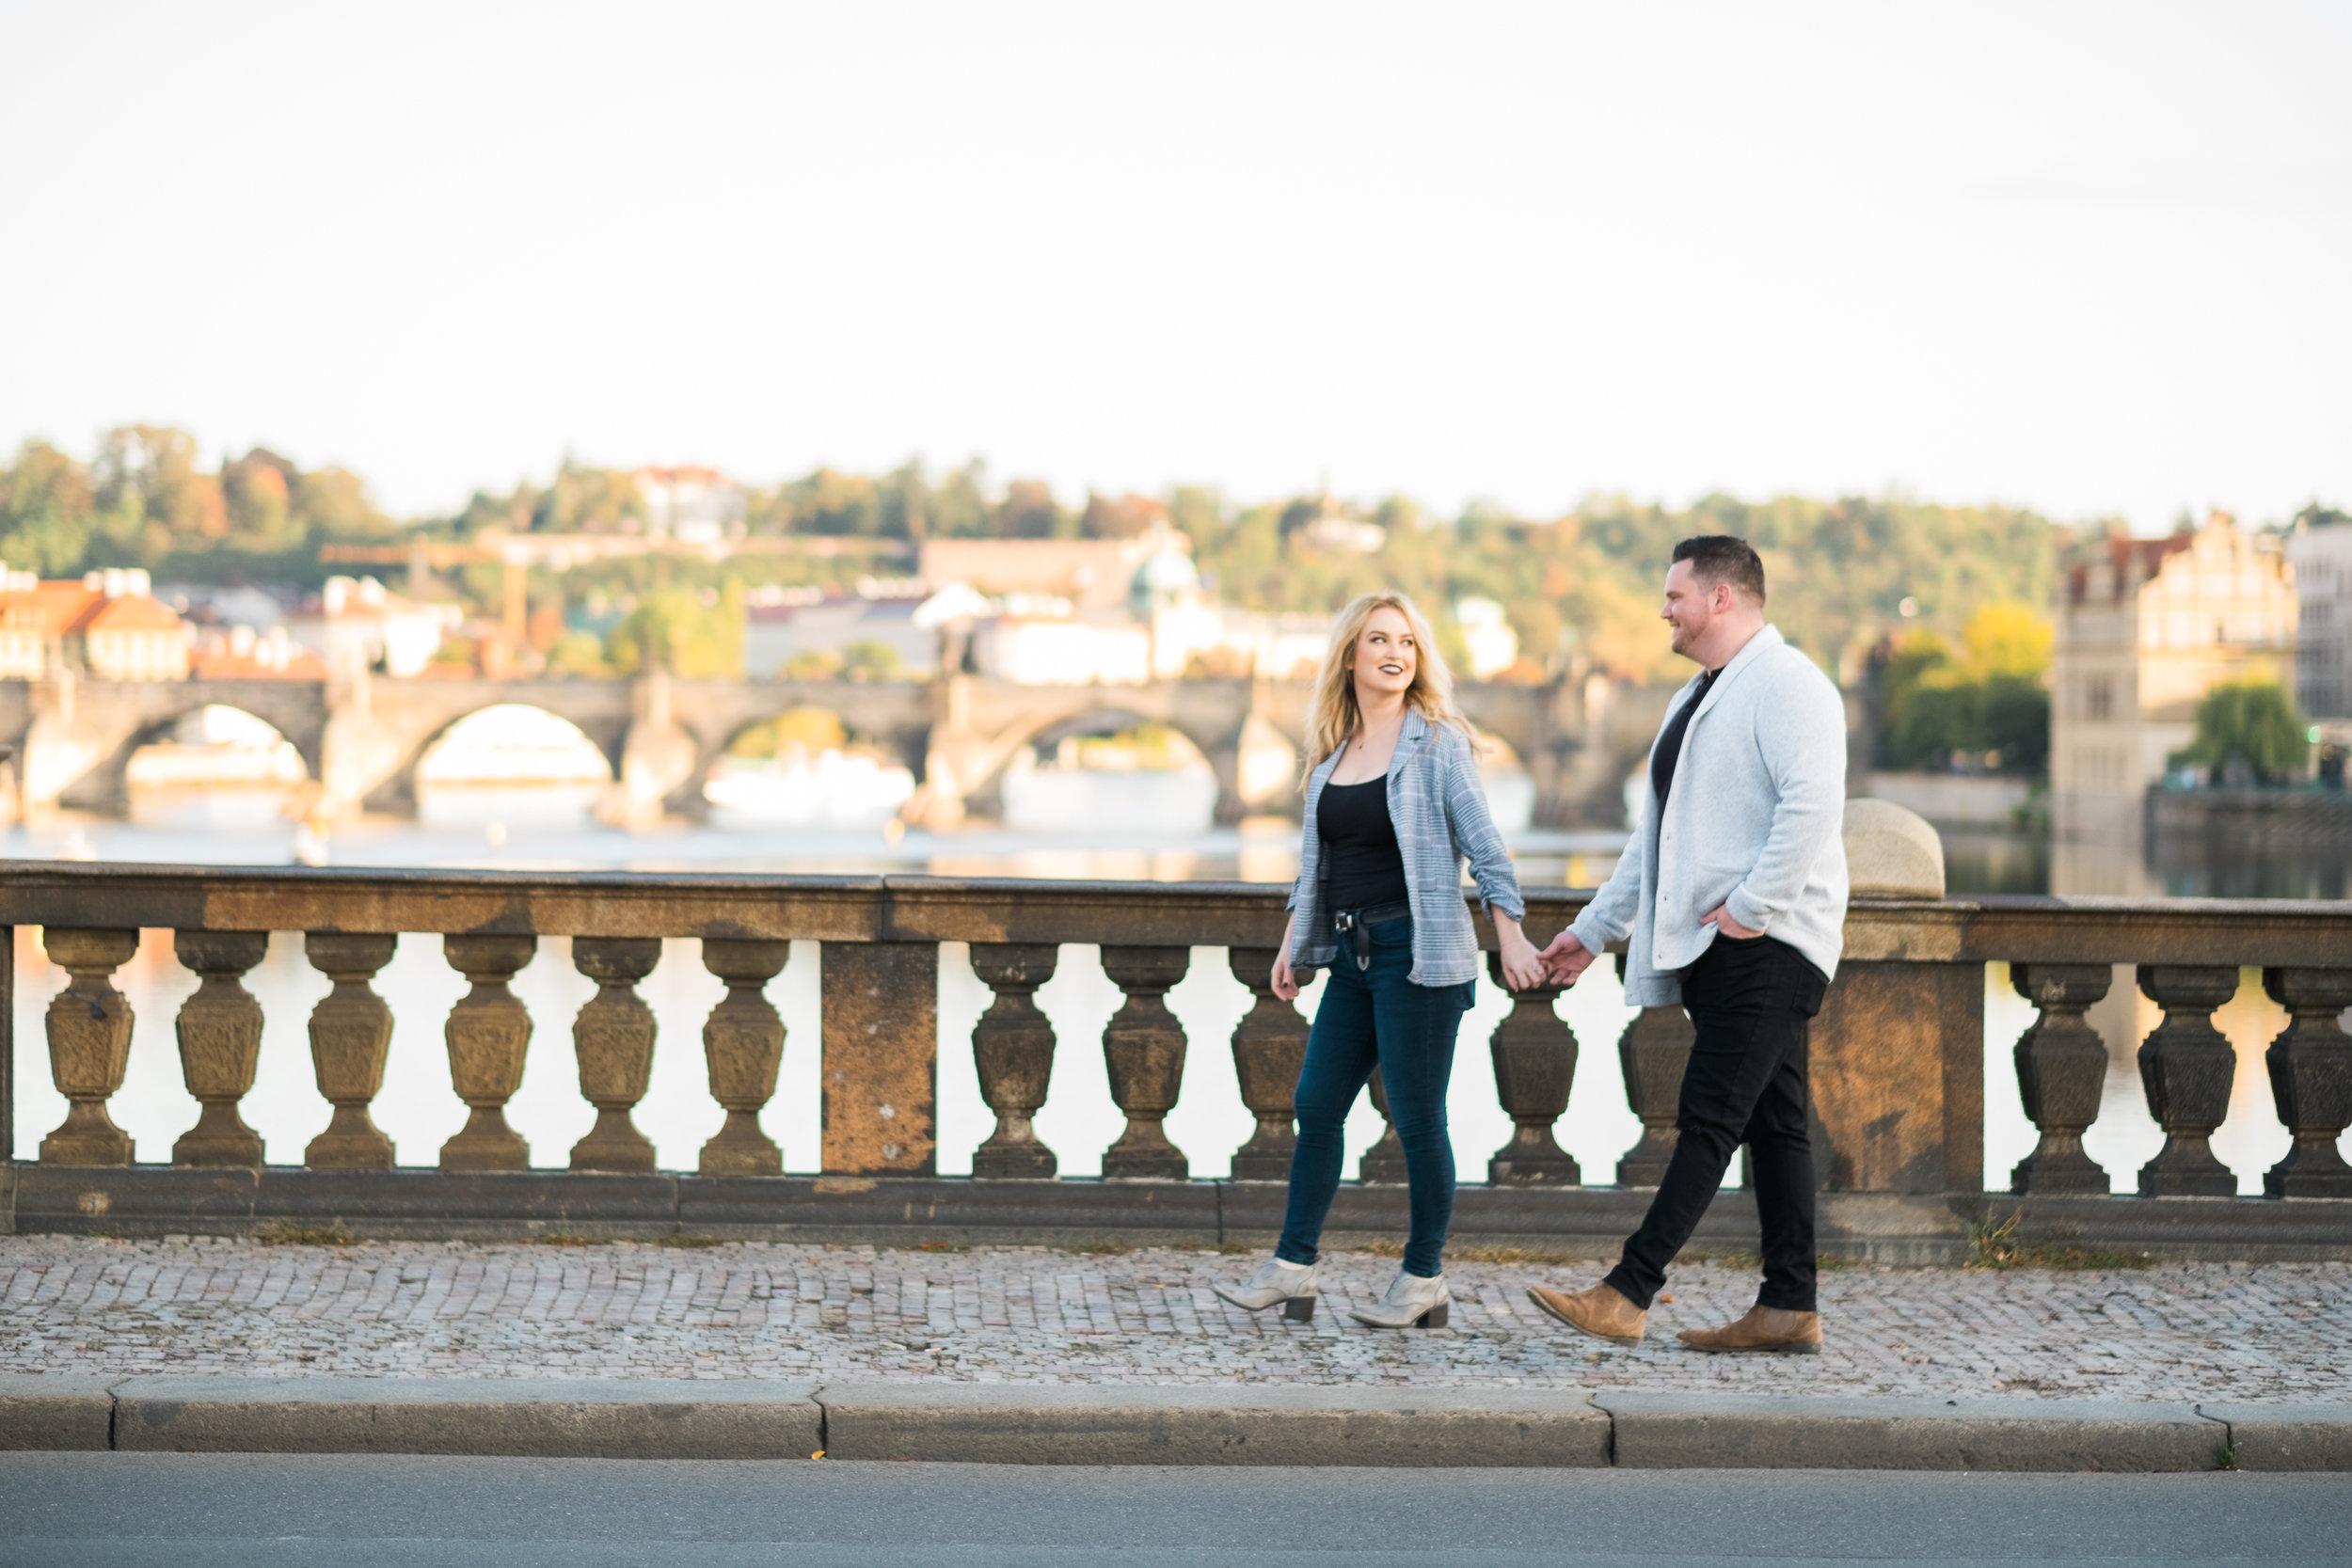 Honeymoon - Carly & Jay   prague, czech repulic